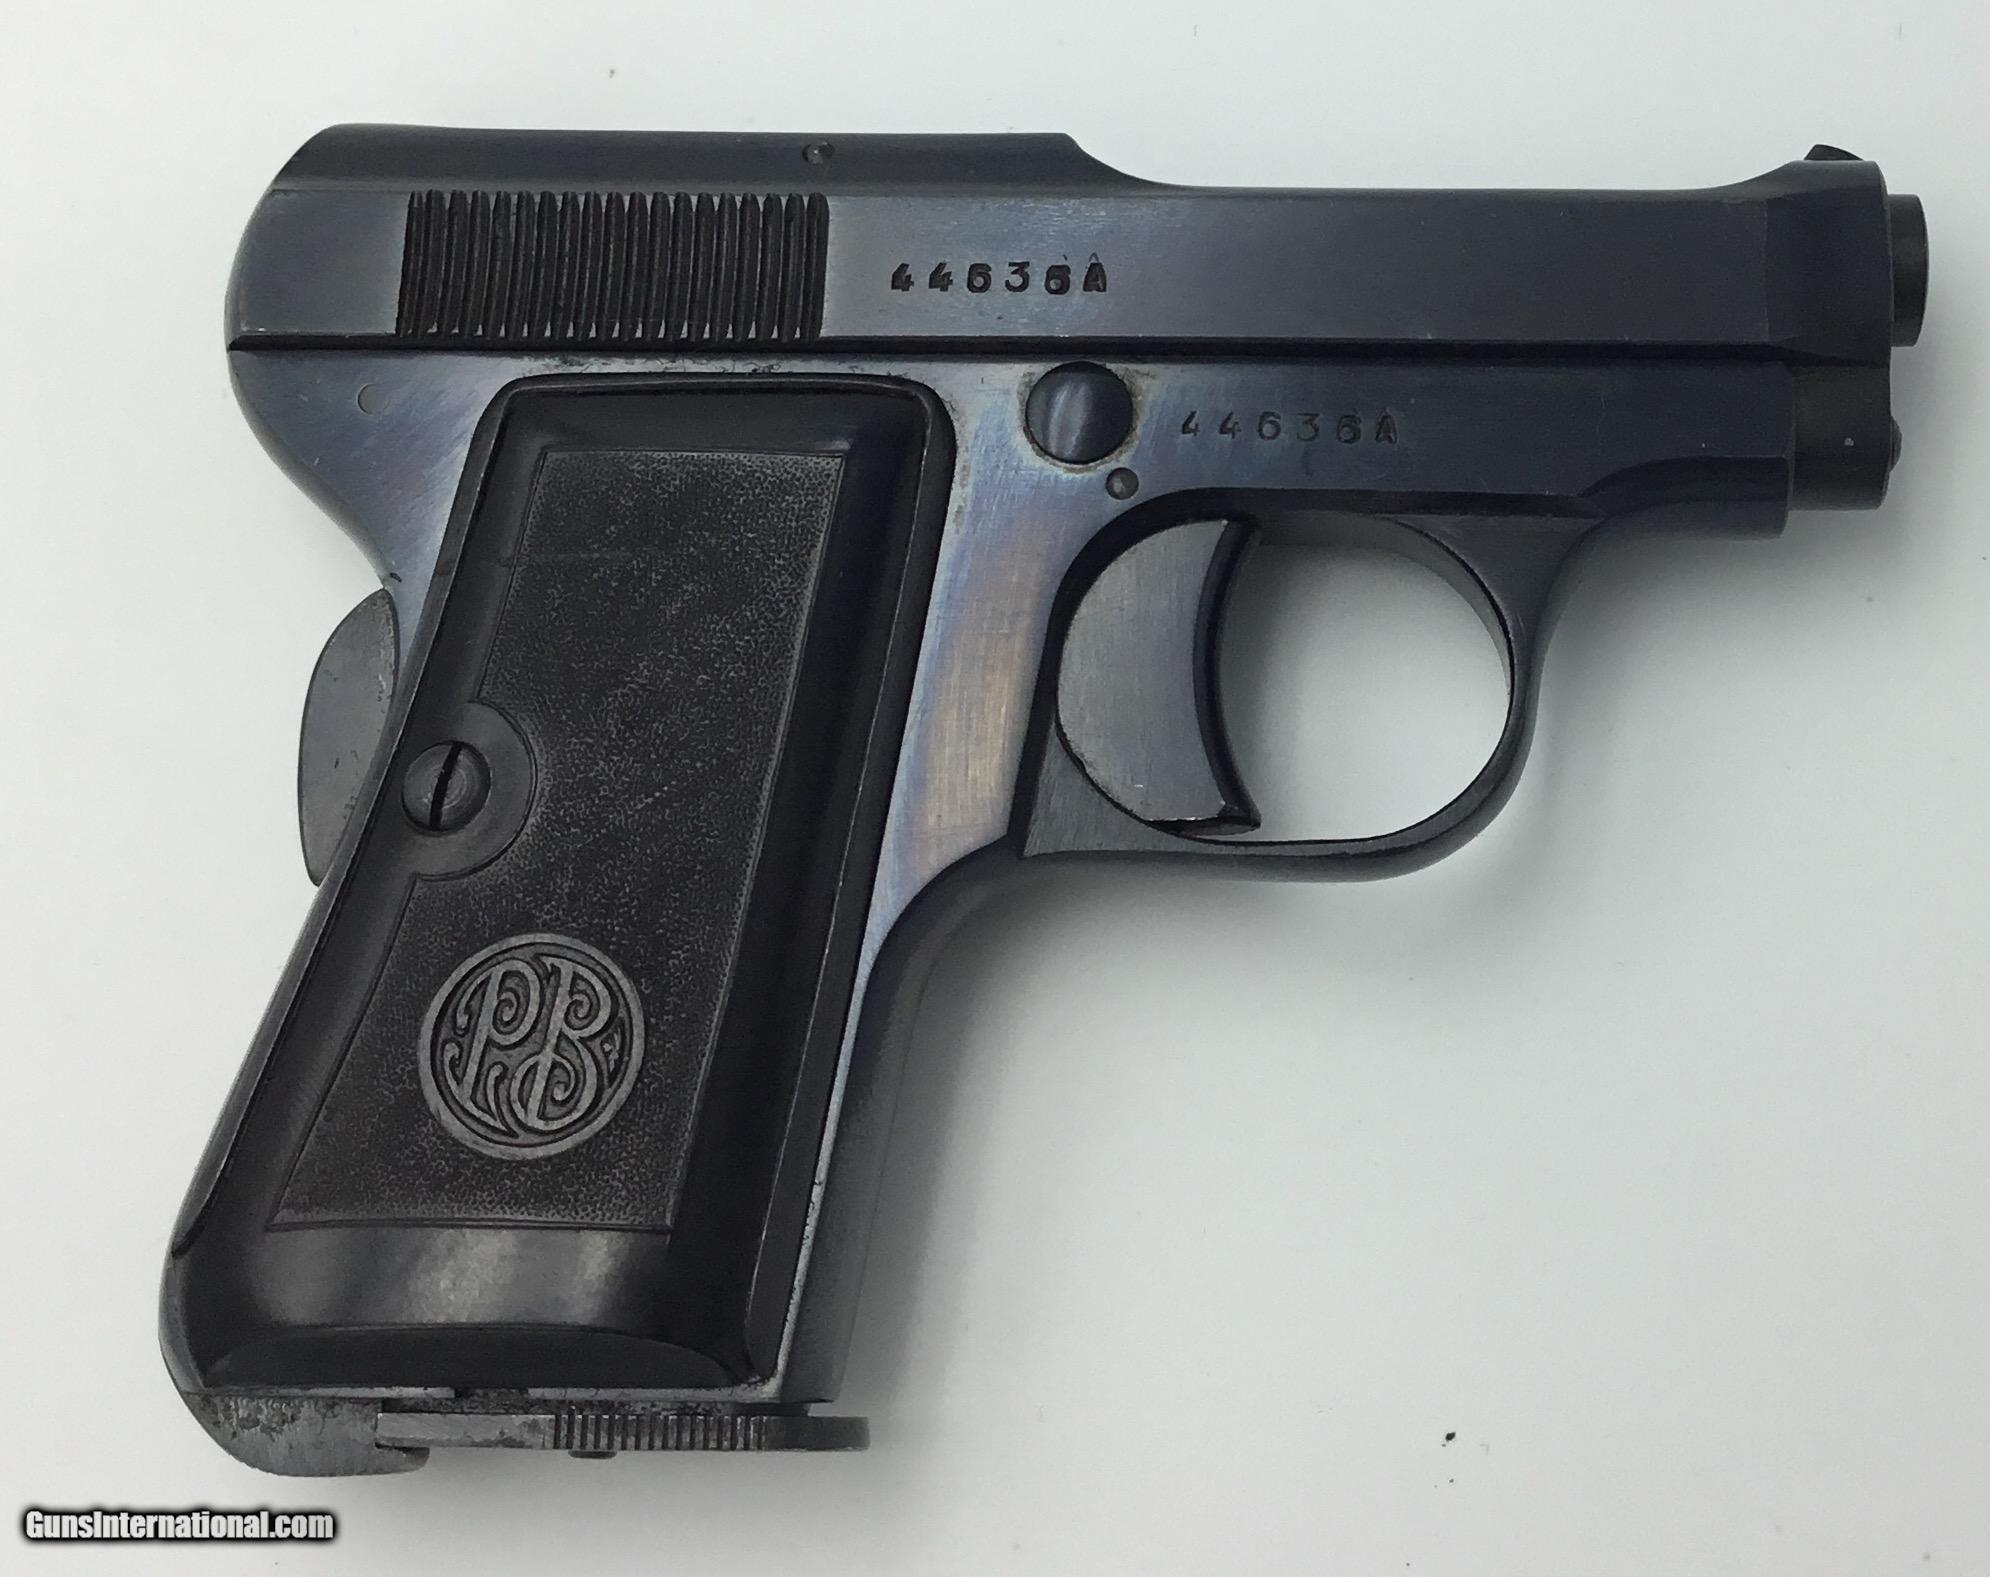 BERETTA MODEL 635 BREVET 6.35 X 25 CAL PISTOL - EXC+ CONDITION Made 1950 -  1 ...